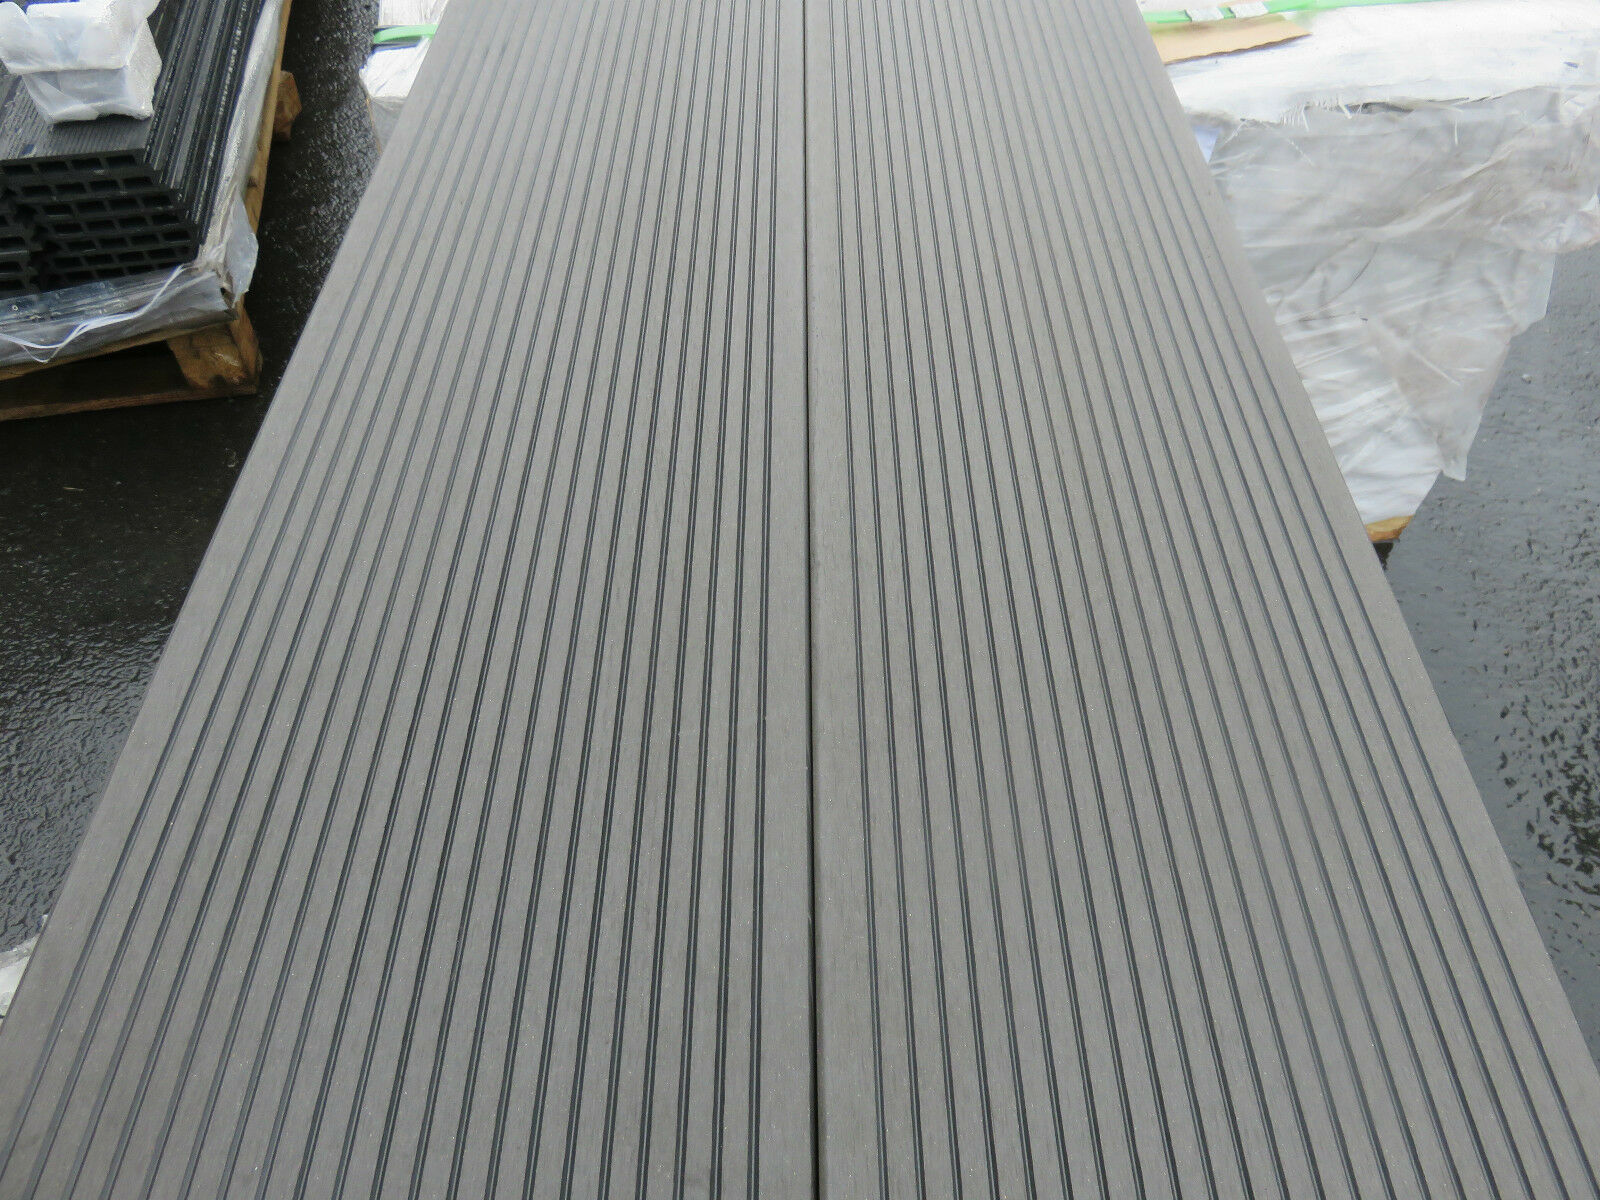 1X Bpc Klick Fliesen Terrassendielen Grau Anthrazit Holz Balkon